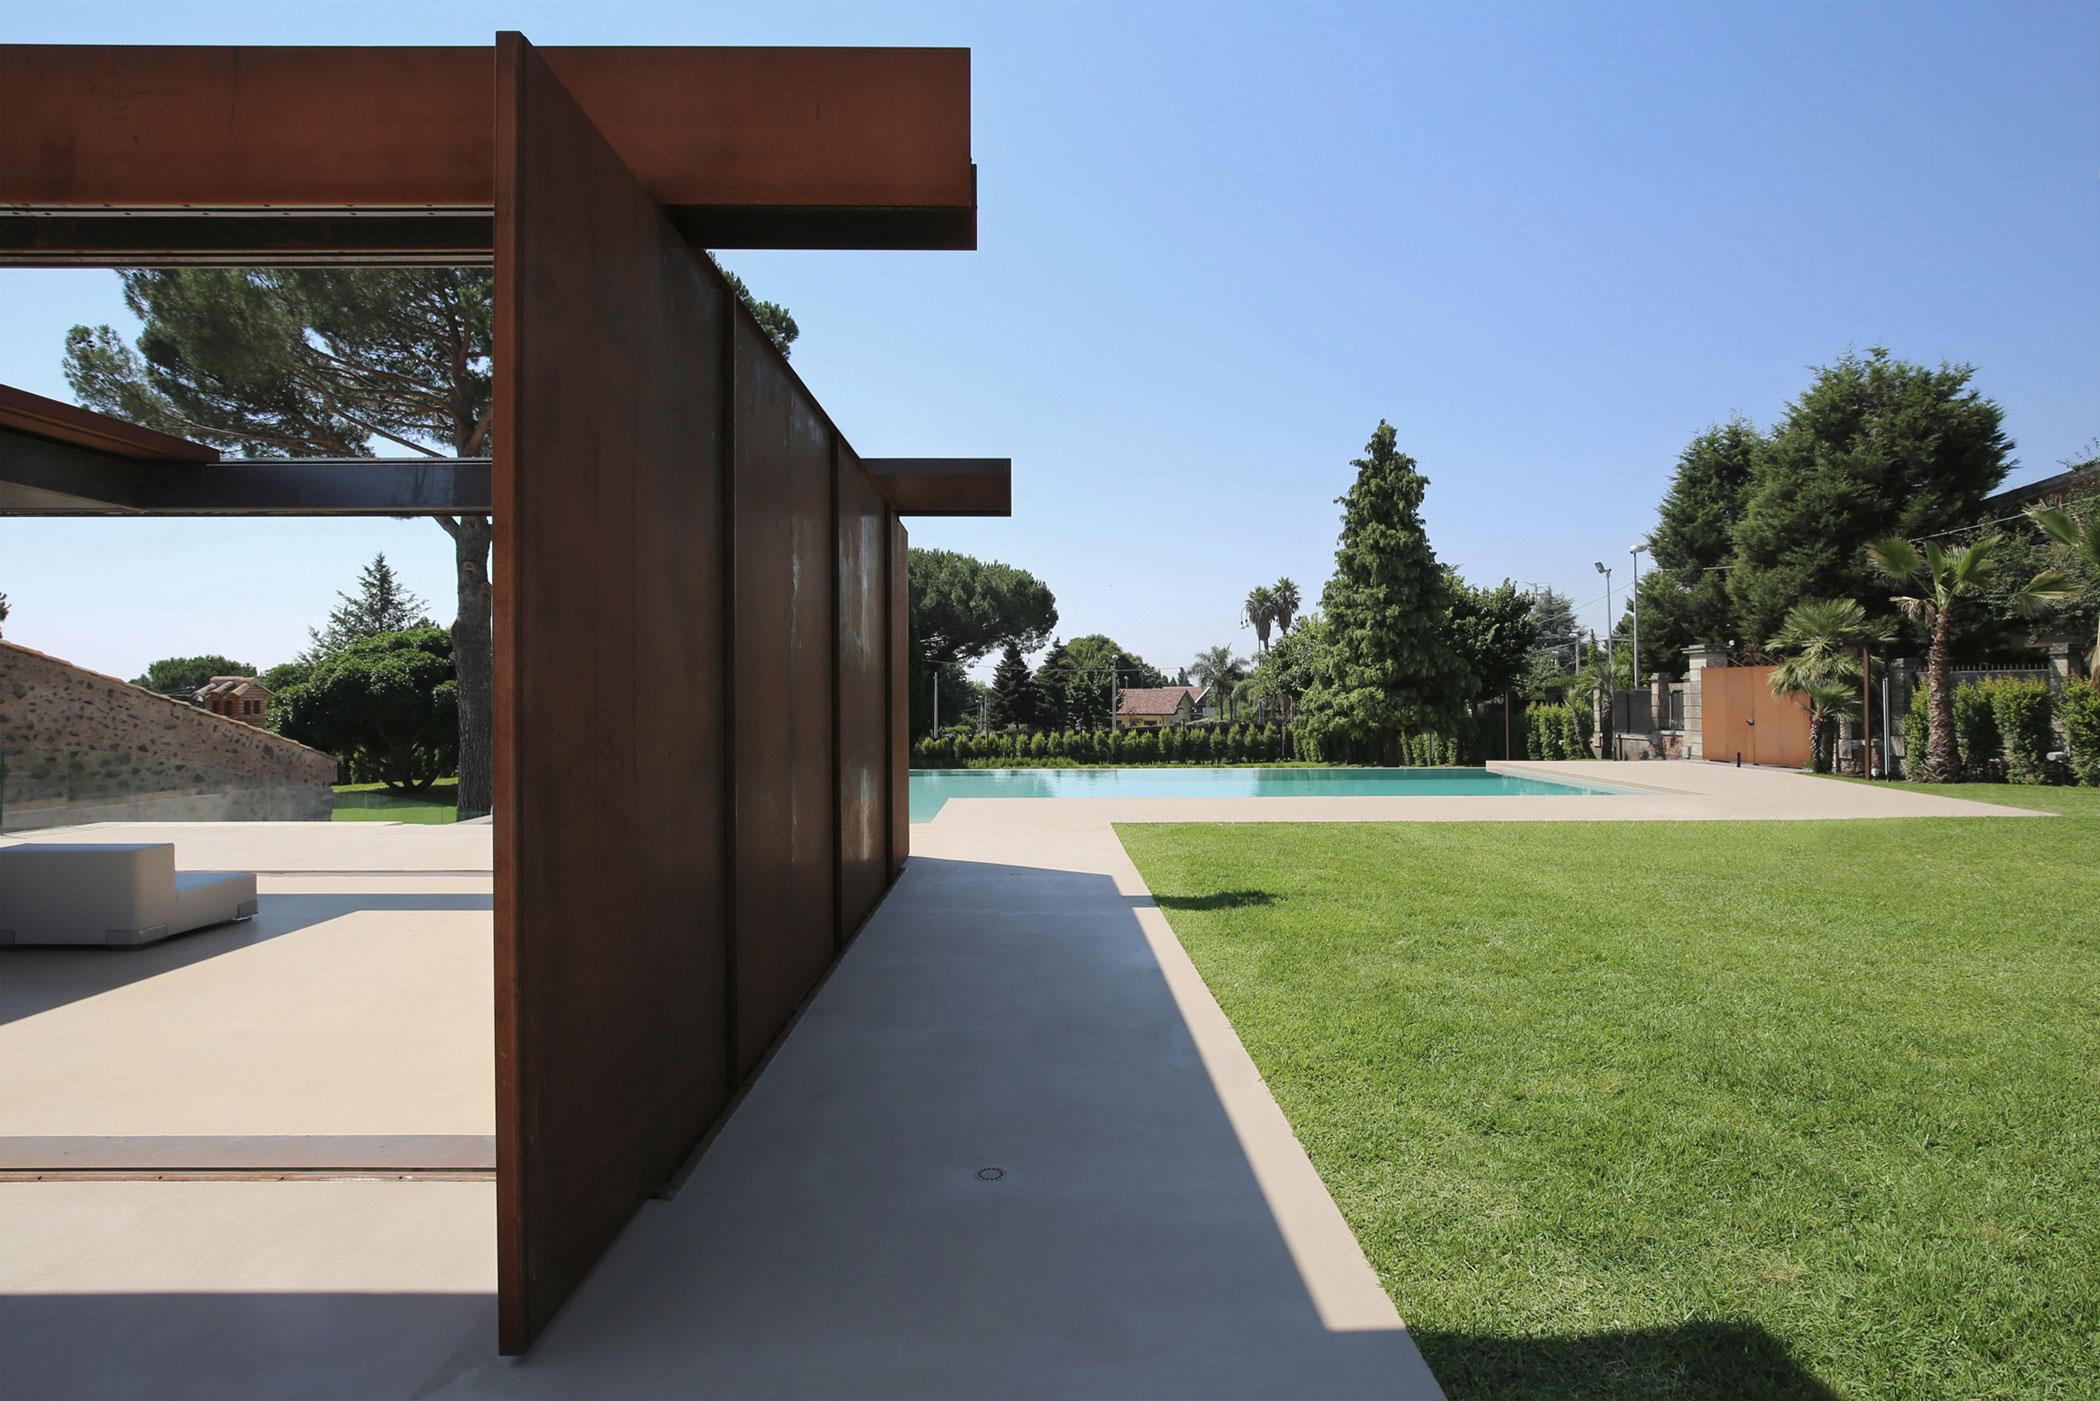 CRV House in Viagrande by ACA Amore Campione Architettura-08